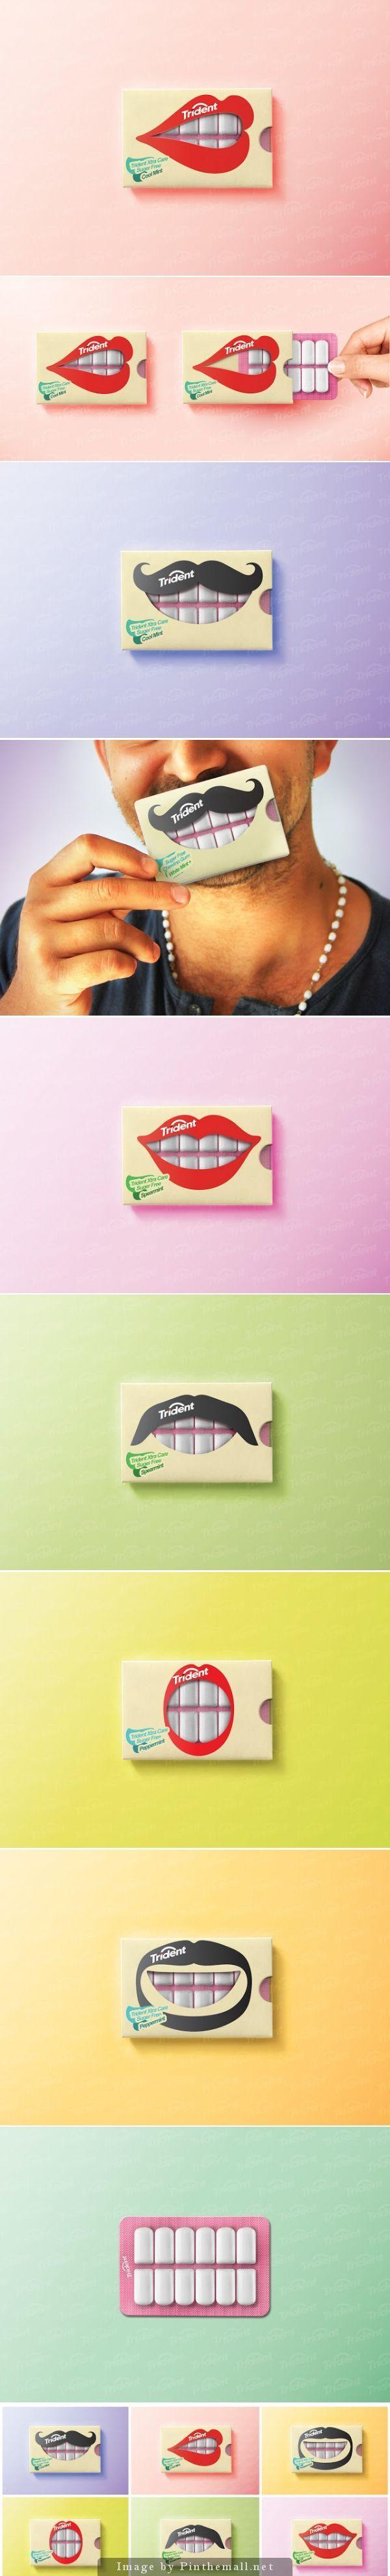 Trident Gum (Concept) Pin by www.alejandrocebrian.com www.pinterest.com/alejandrobox